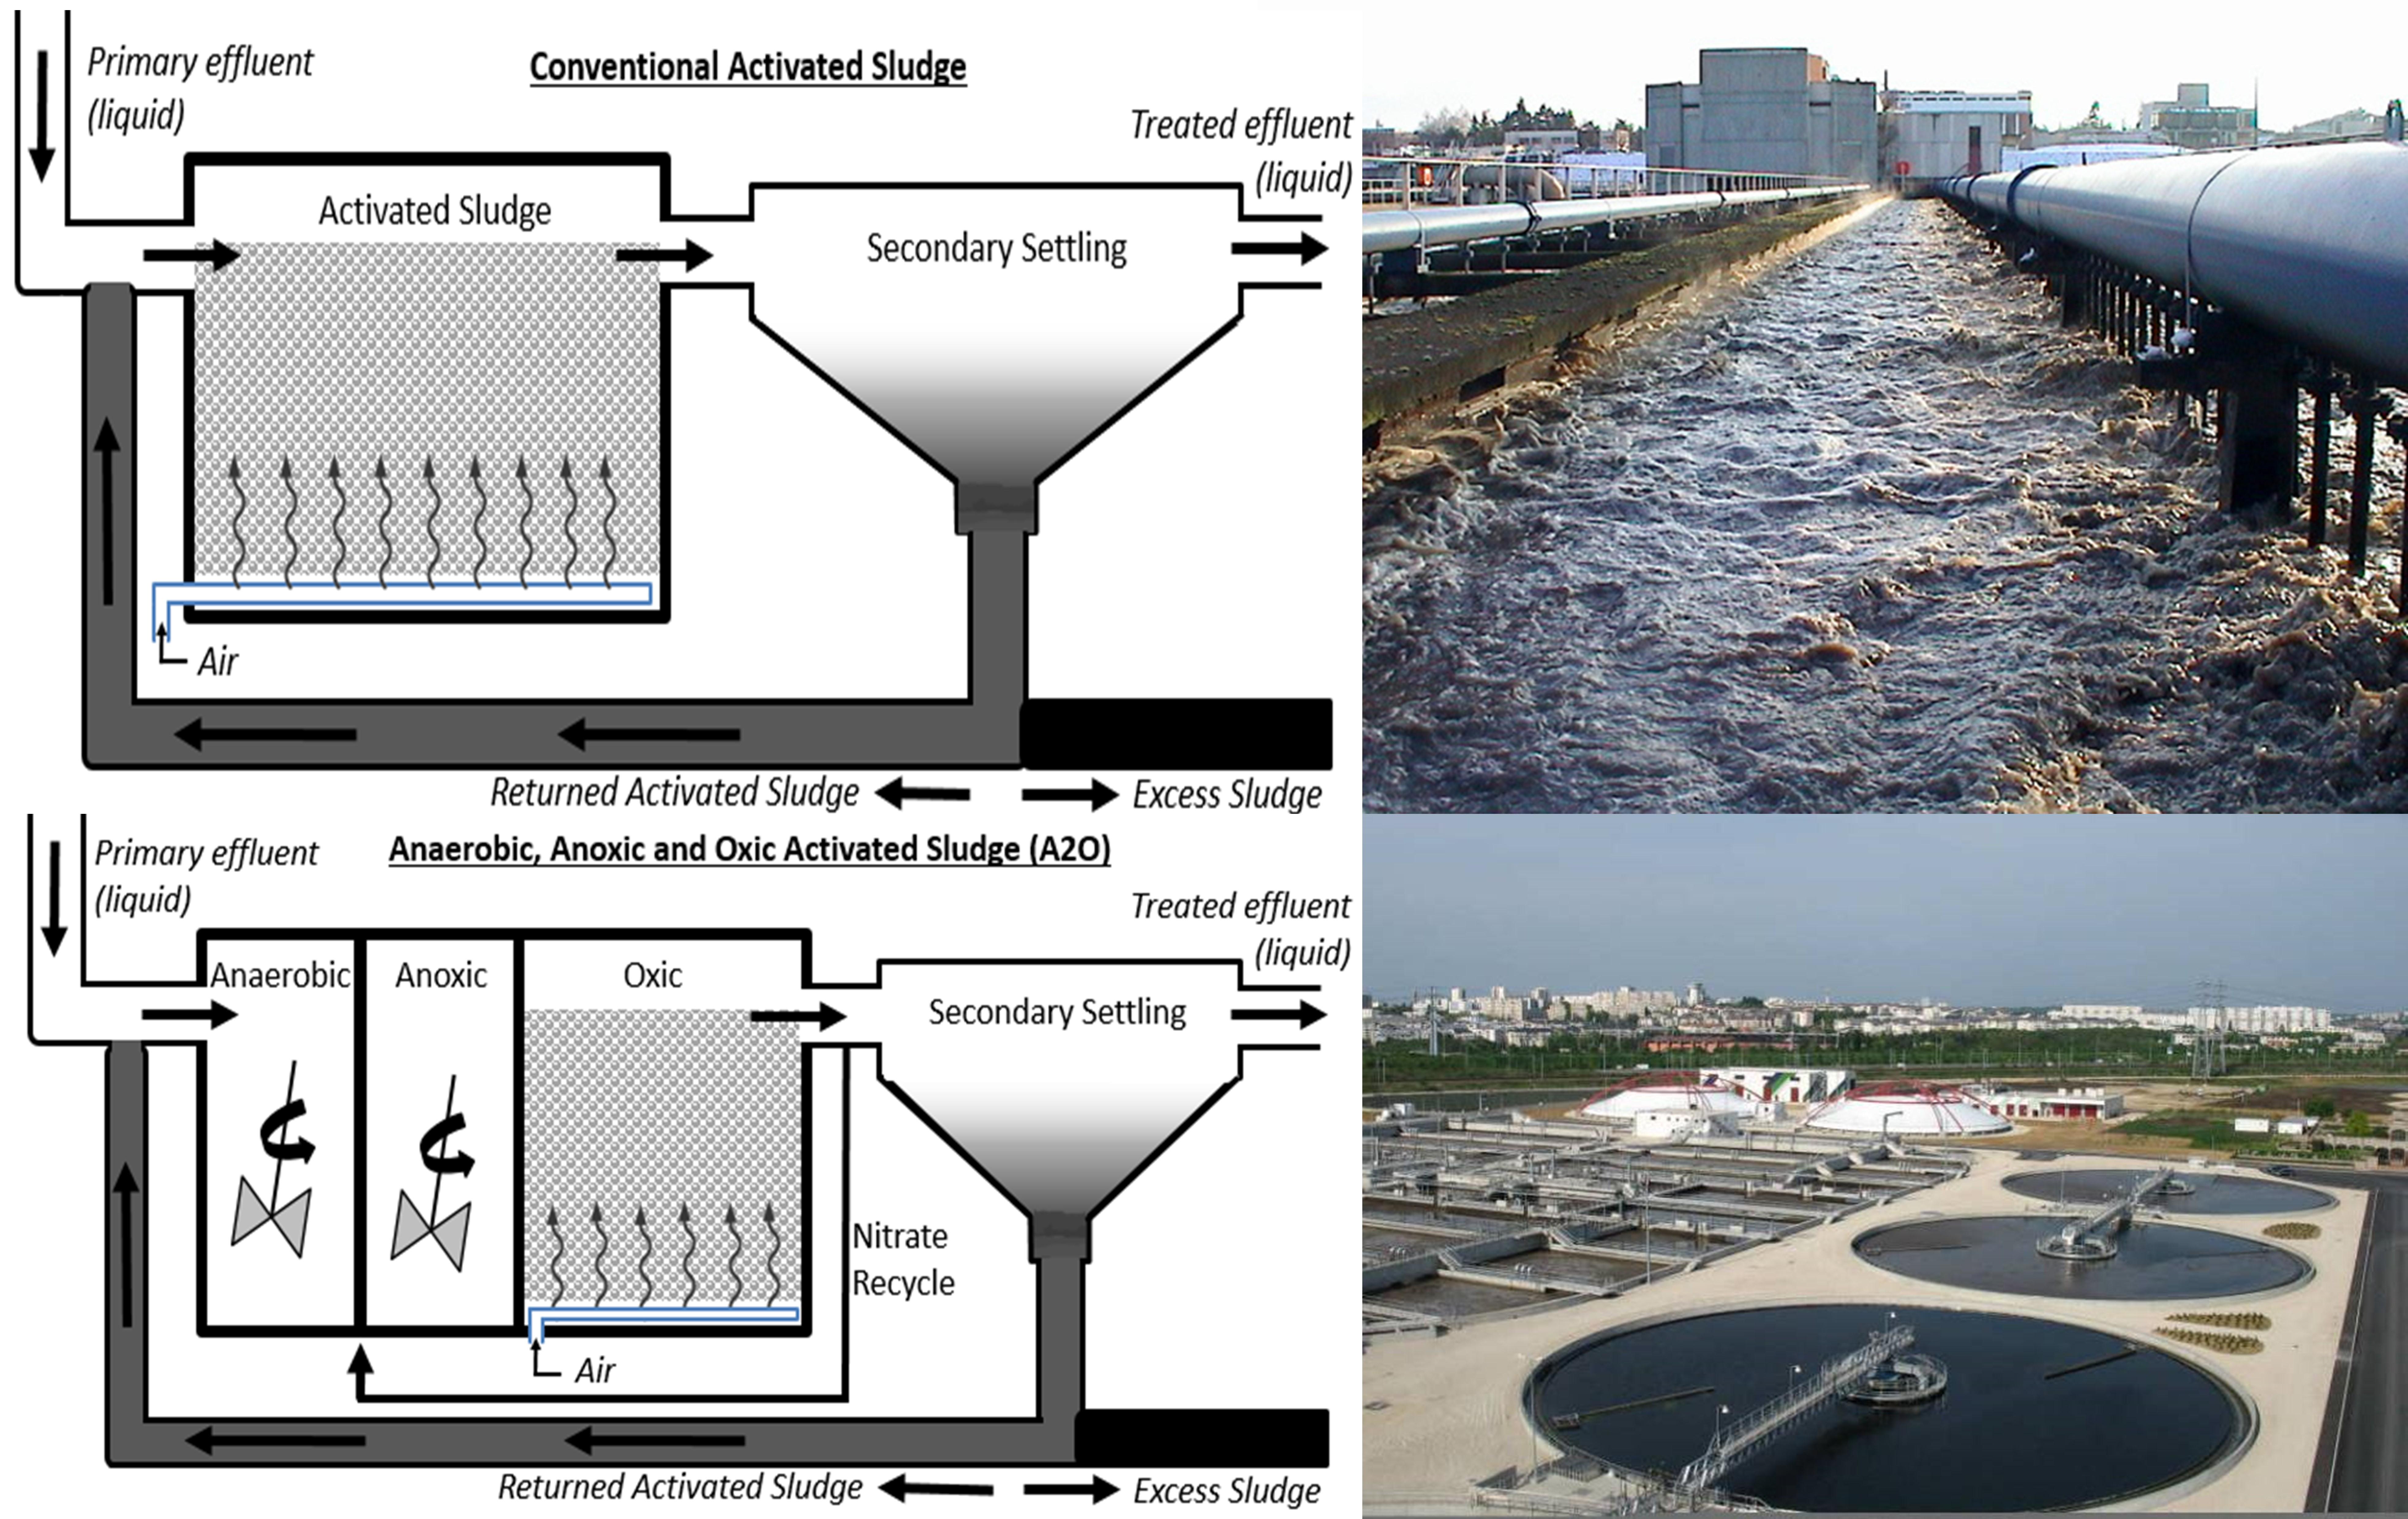 Activated Sludge Global Water Pathogen Project